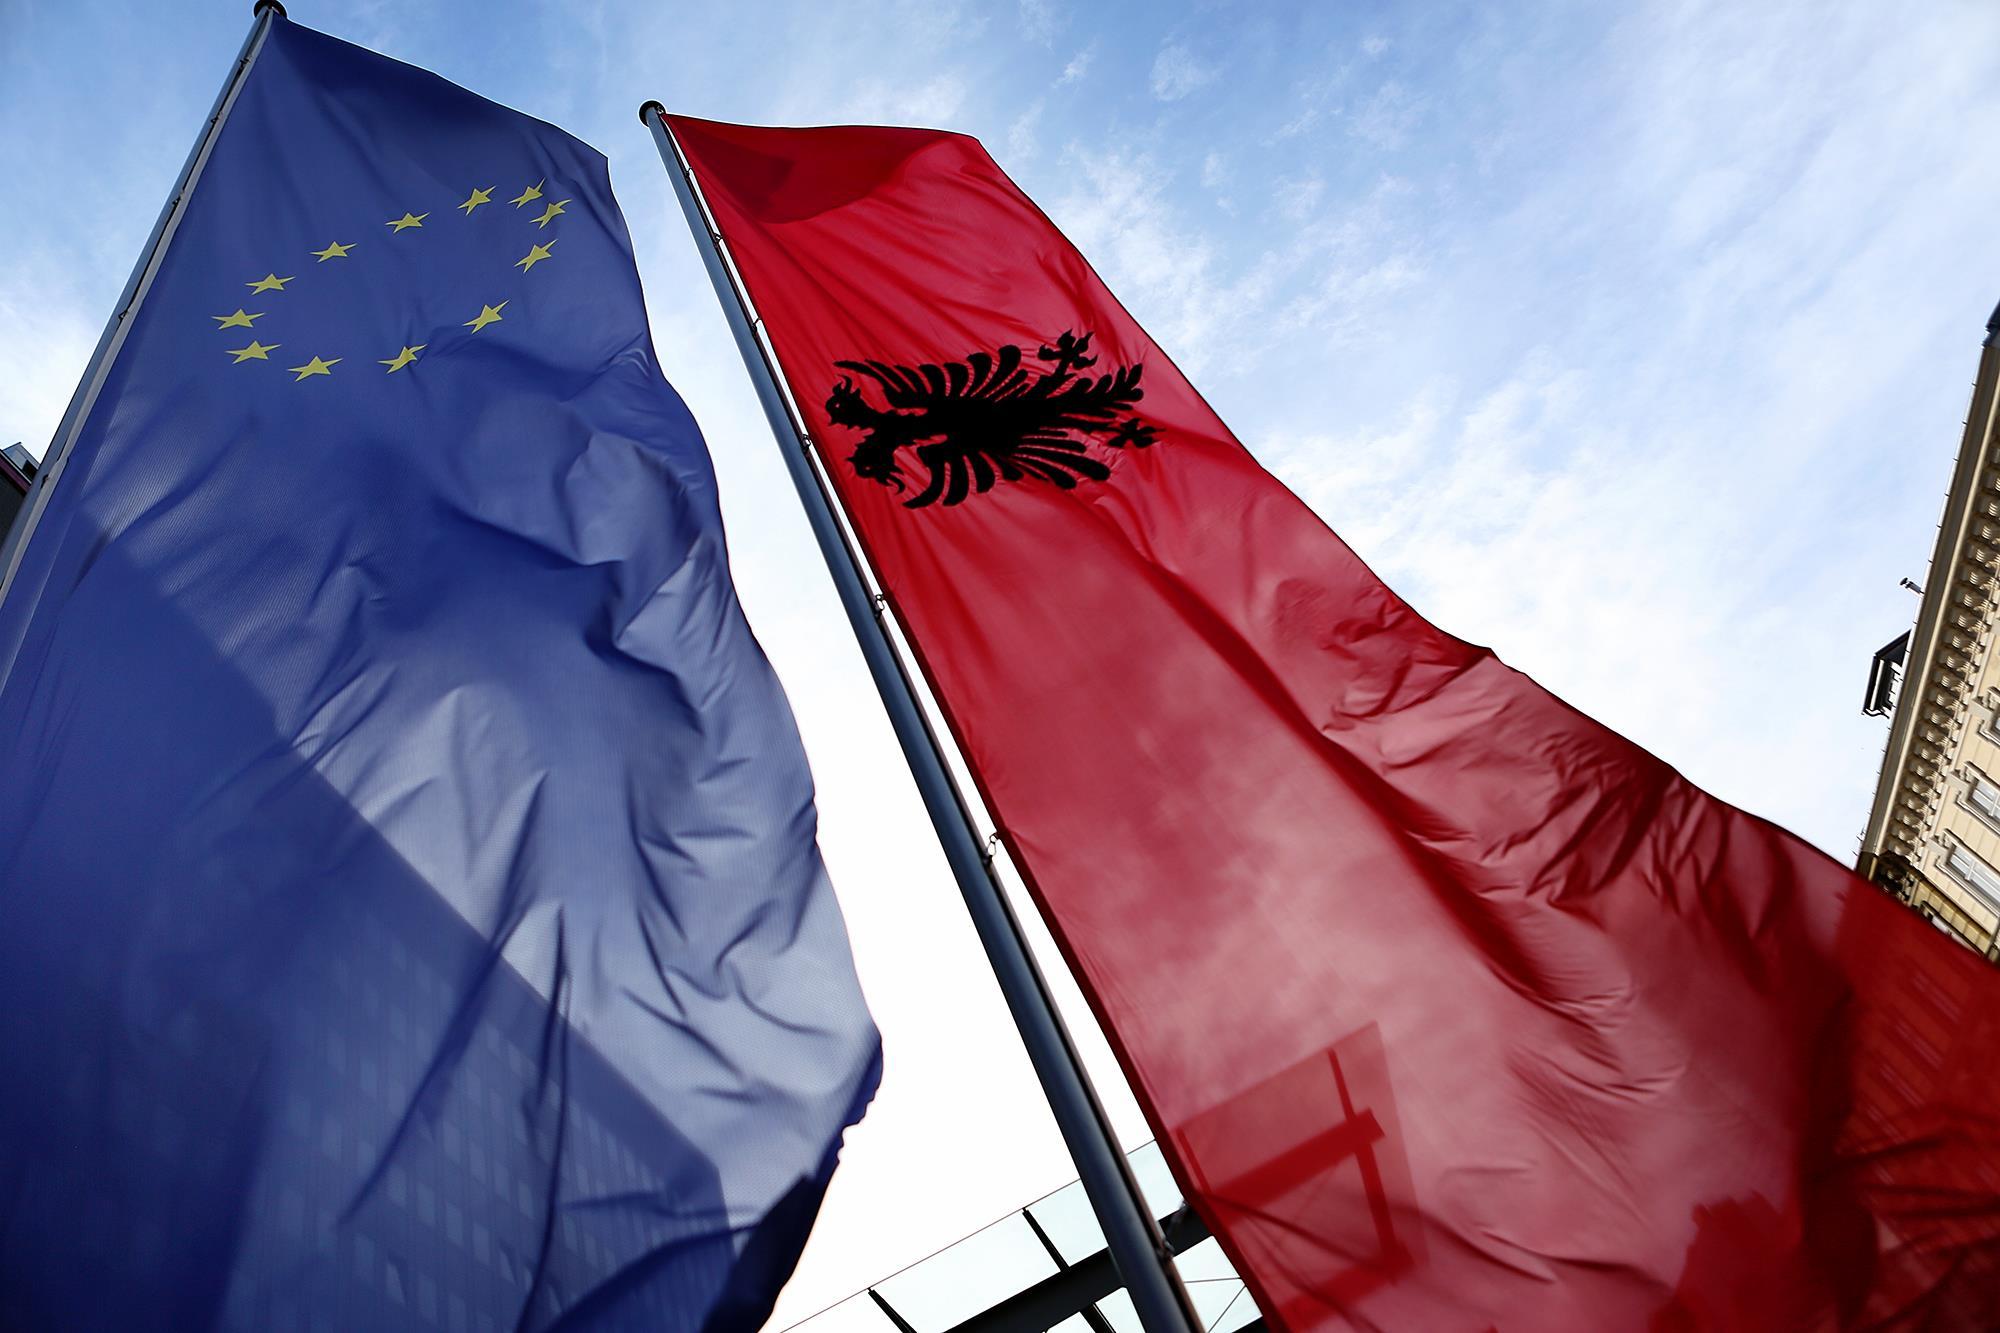 BiEPAG's Experts React: EC 2021 Progress Report on Albania